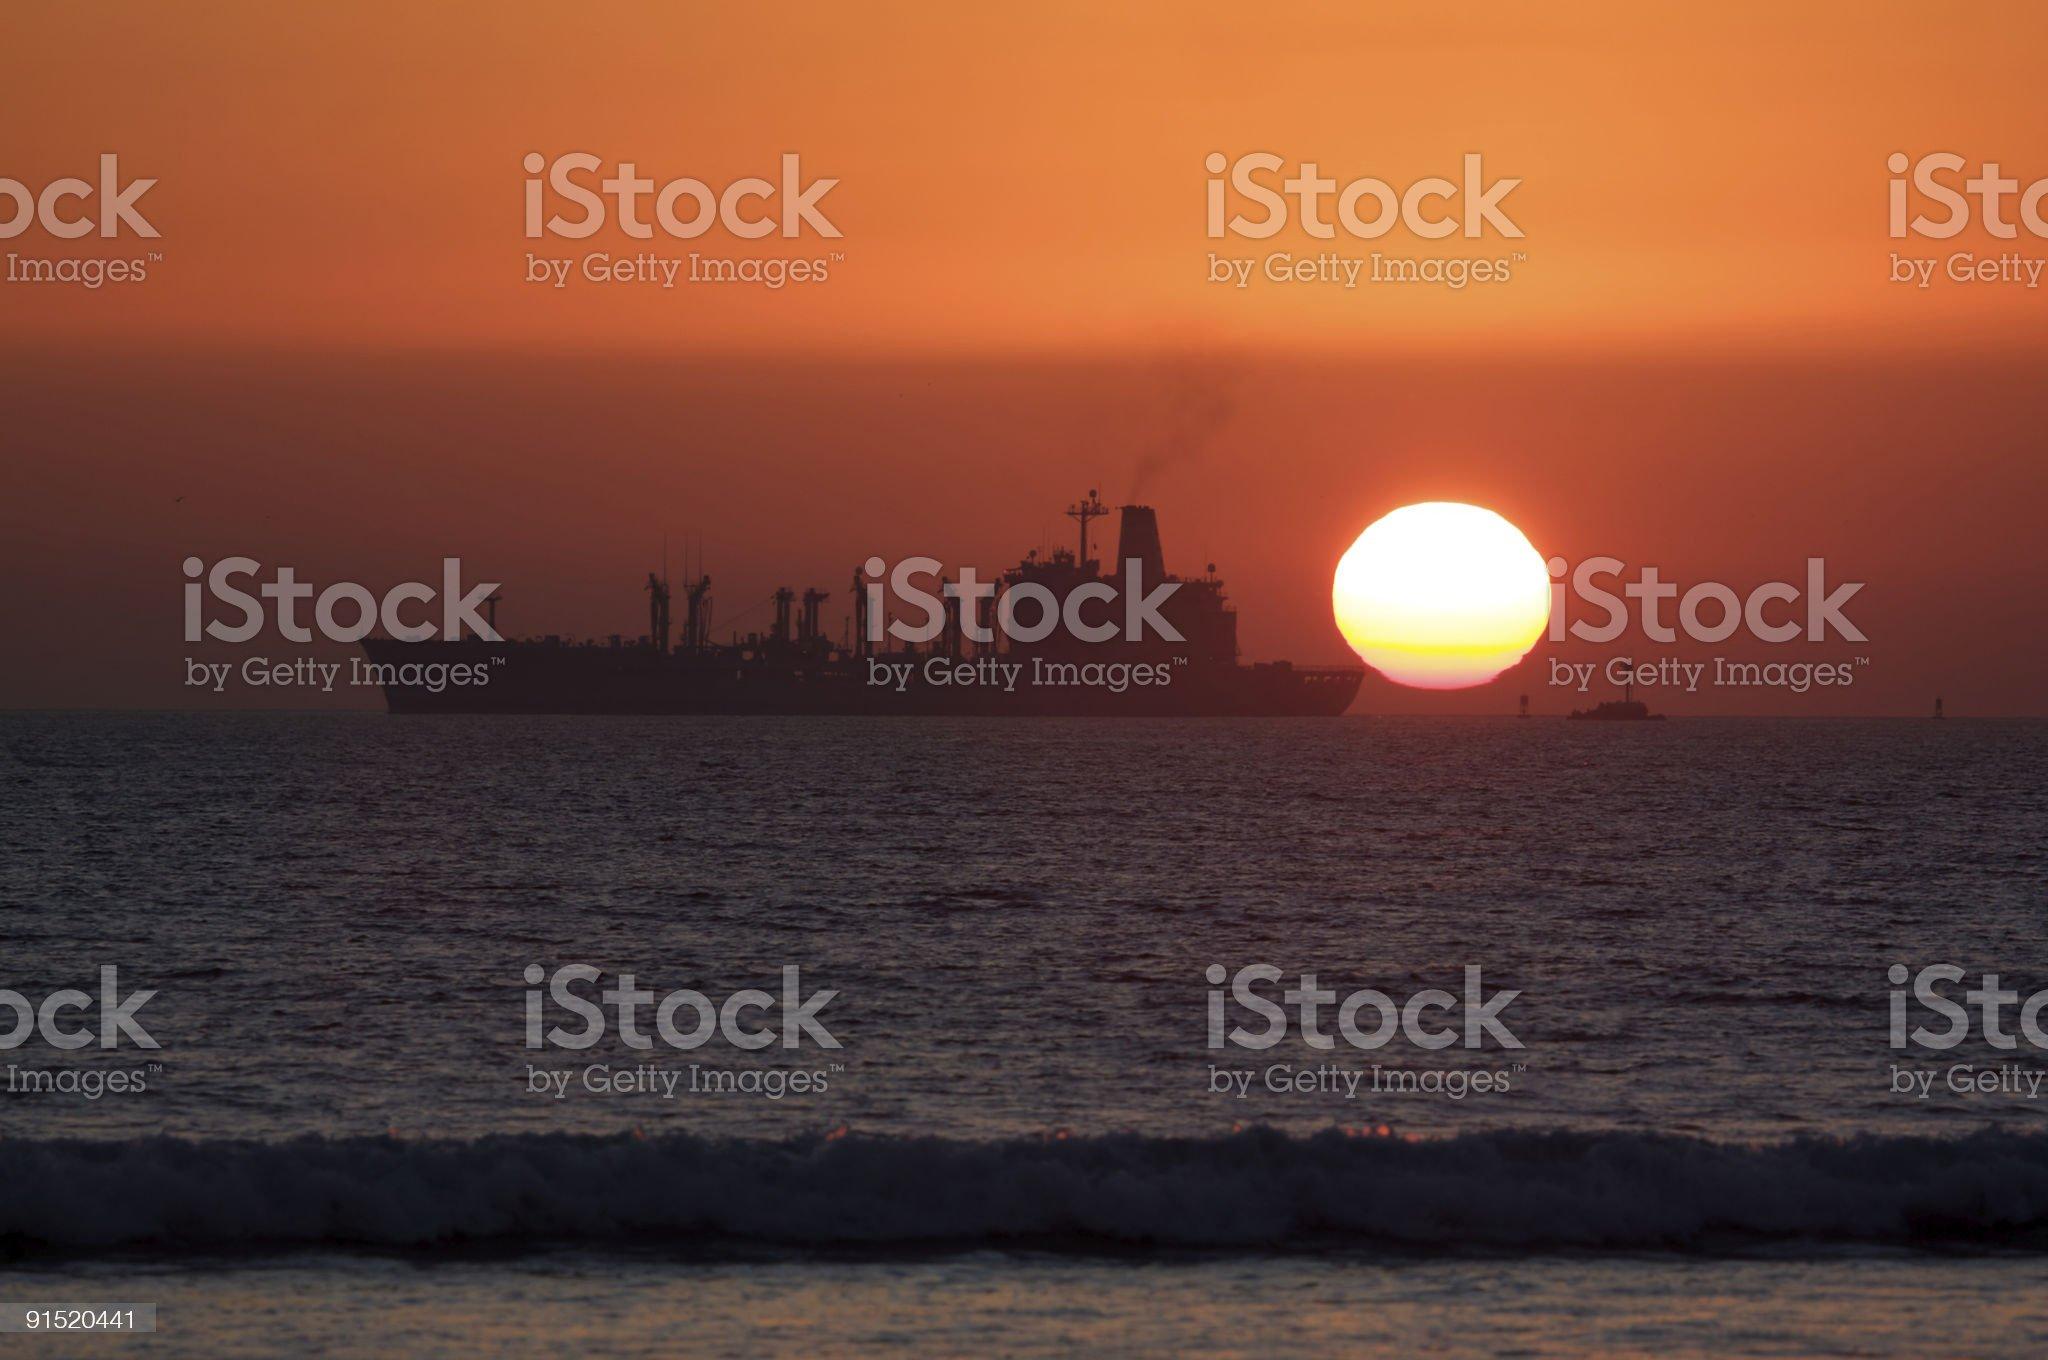 Replenishment (Resupply) Ship at Sunset royalty-free stock photo